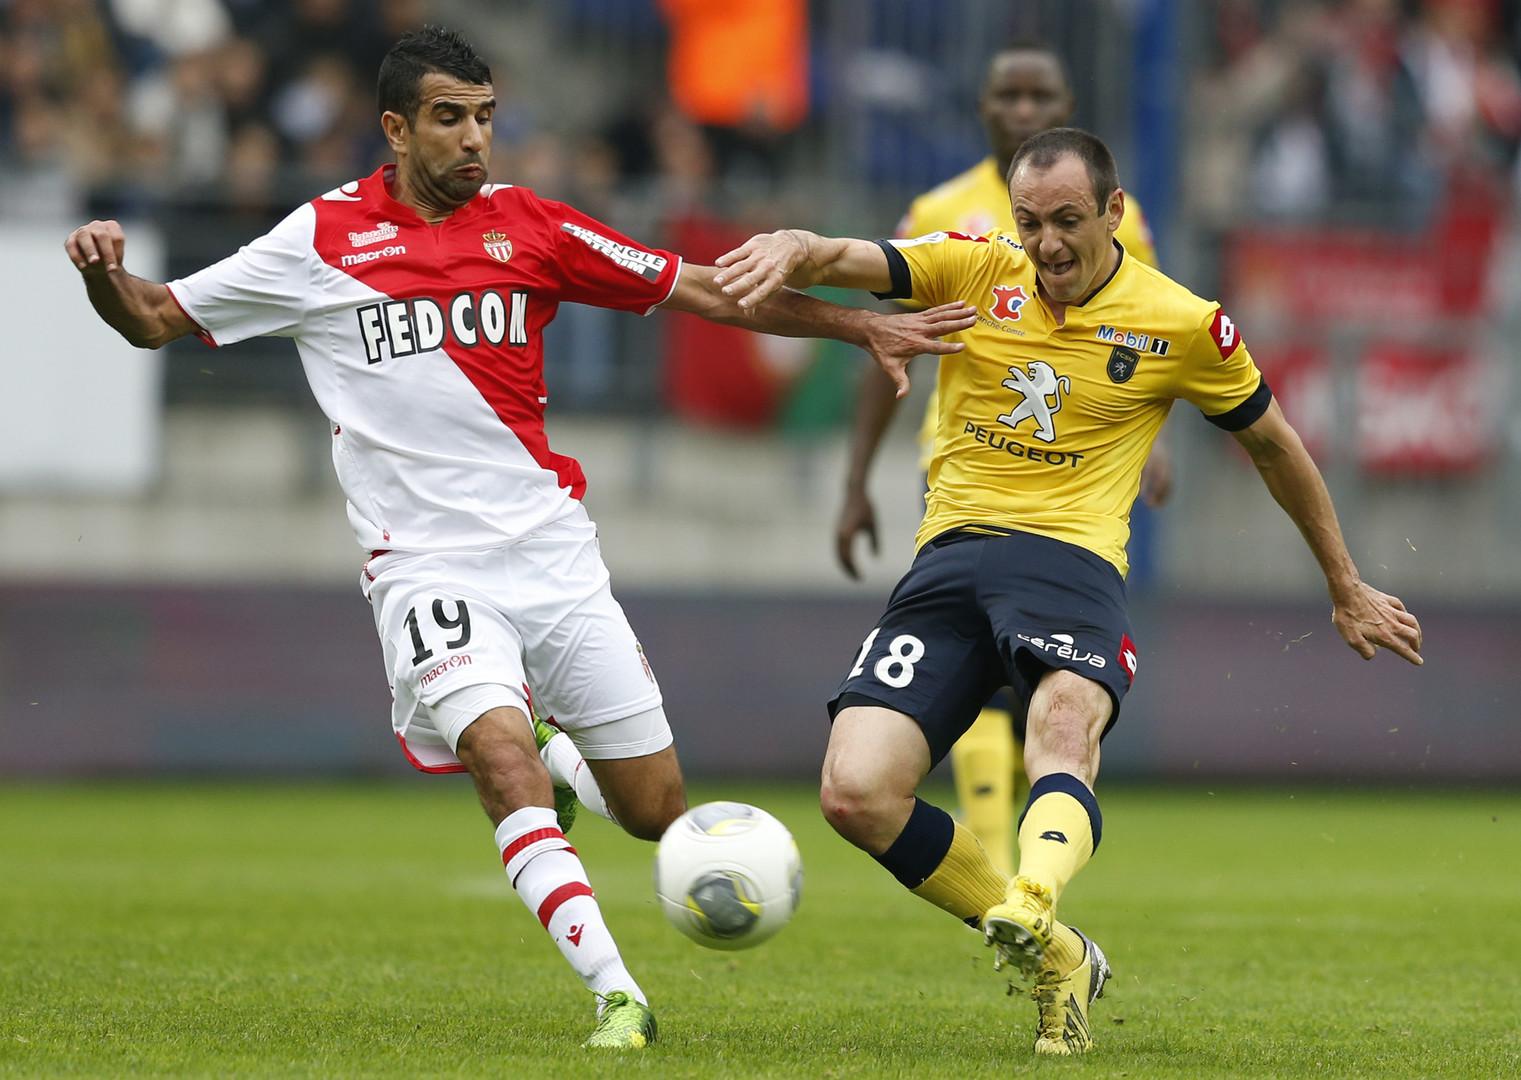 Le FC Sochaux affrontant l'AS Monaco en 2013